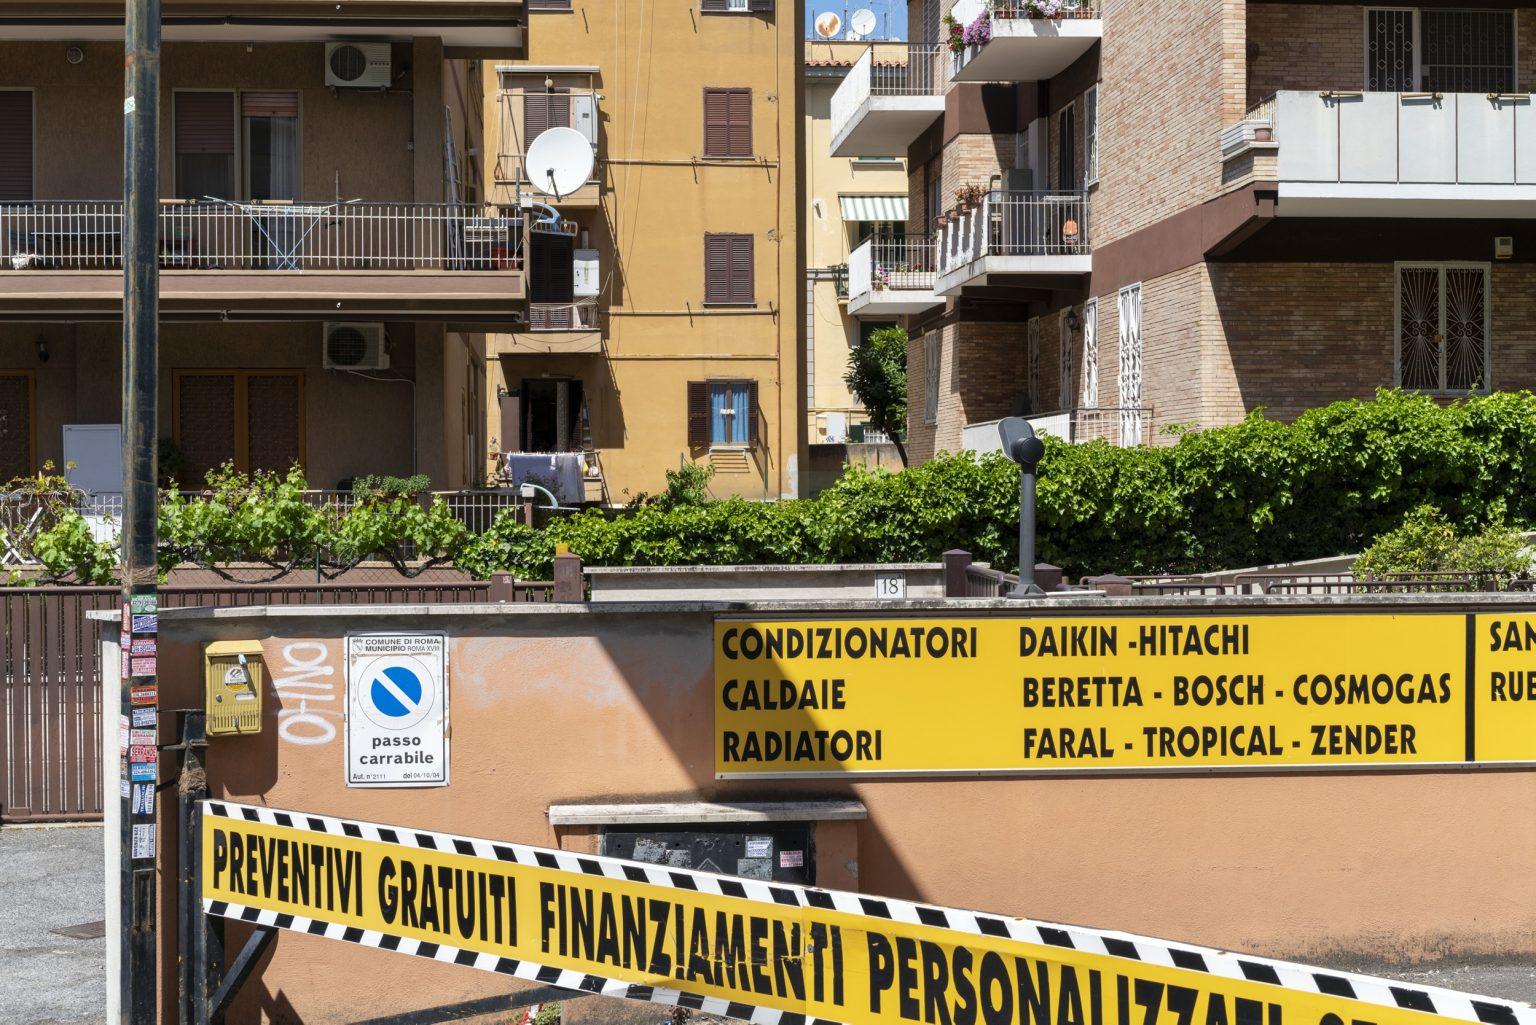 Rome, May 2017 - Via Ennio Bonifazi. Boccea district. >< Roma, maggio 2017 - Via Ennio Bonifazi. Quartiere Boccea.